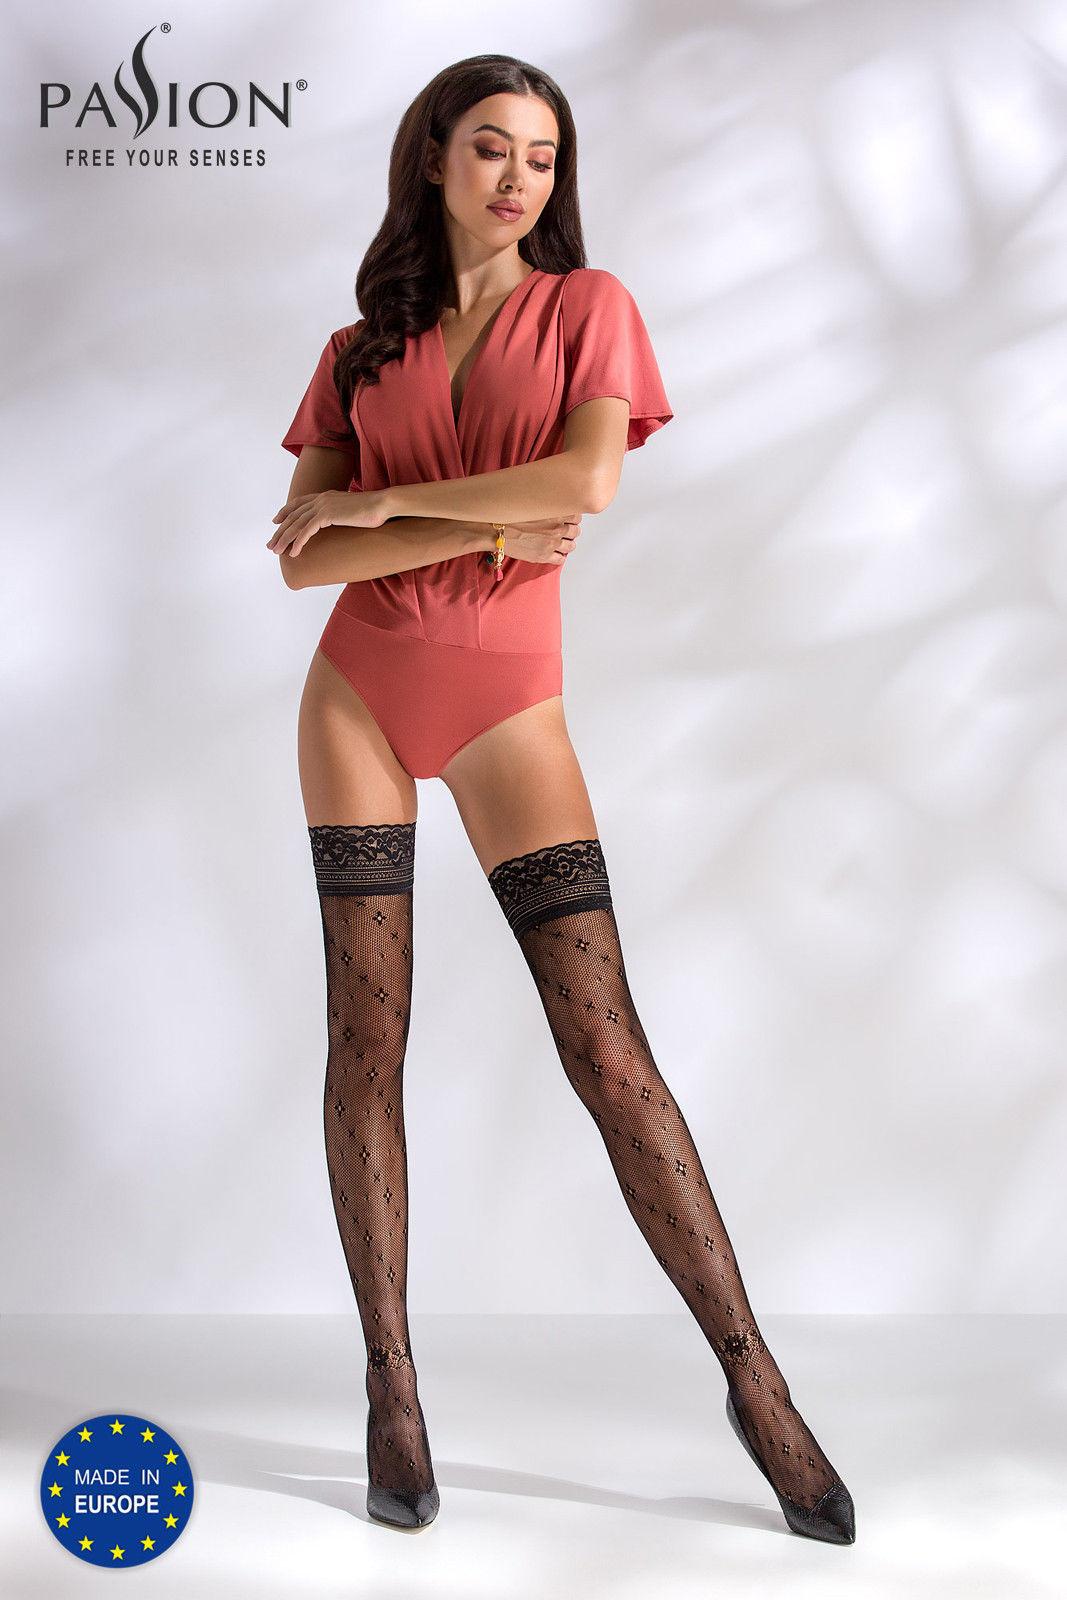 Passion ST016 Stockings Nero